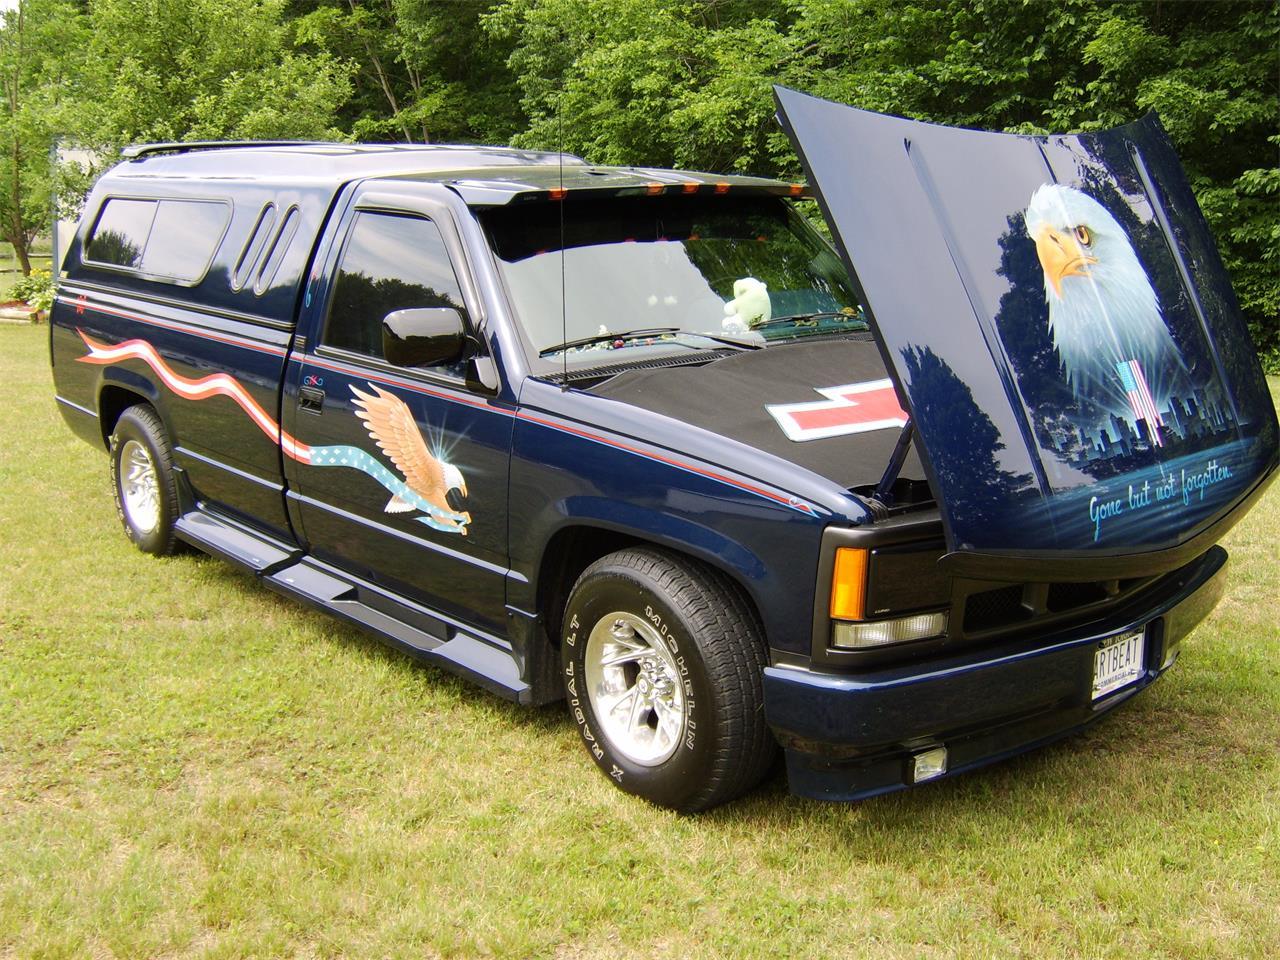 Large Picture of '93 Chevrolet C/K 1500 located in Windsor New York - $9,000.00 - K0FJ